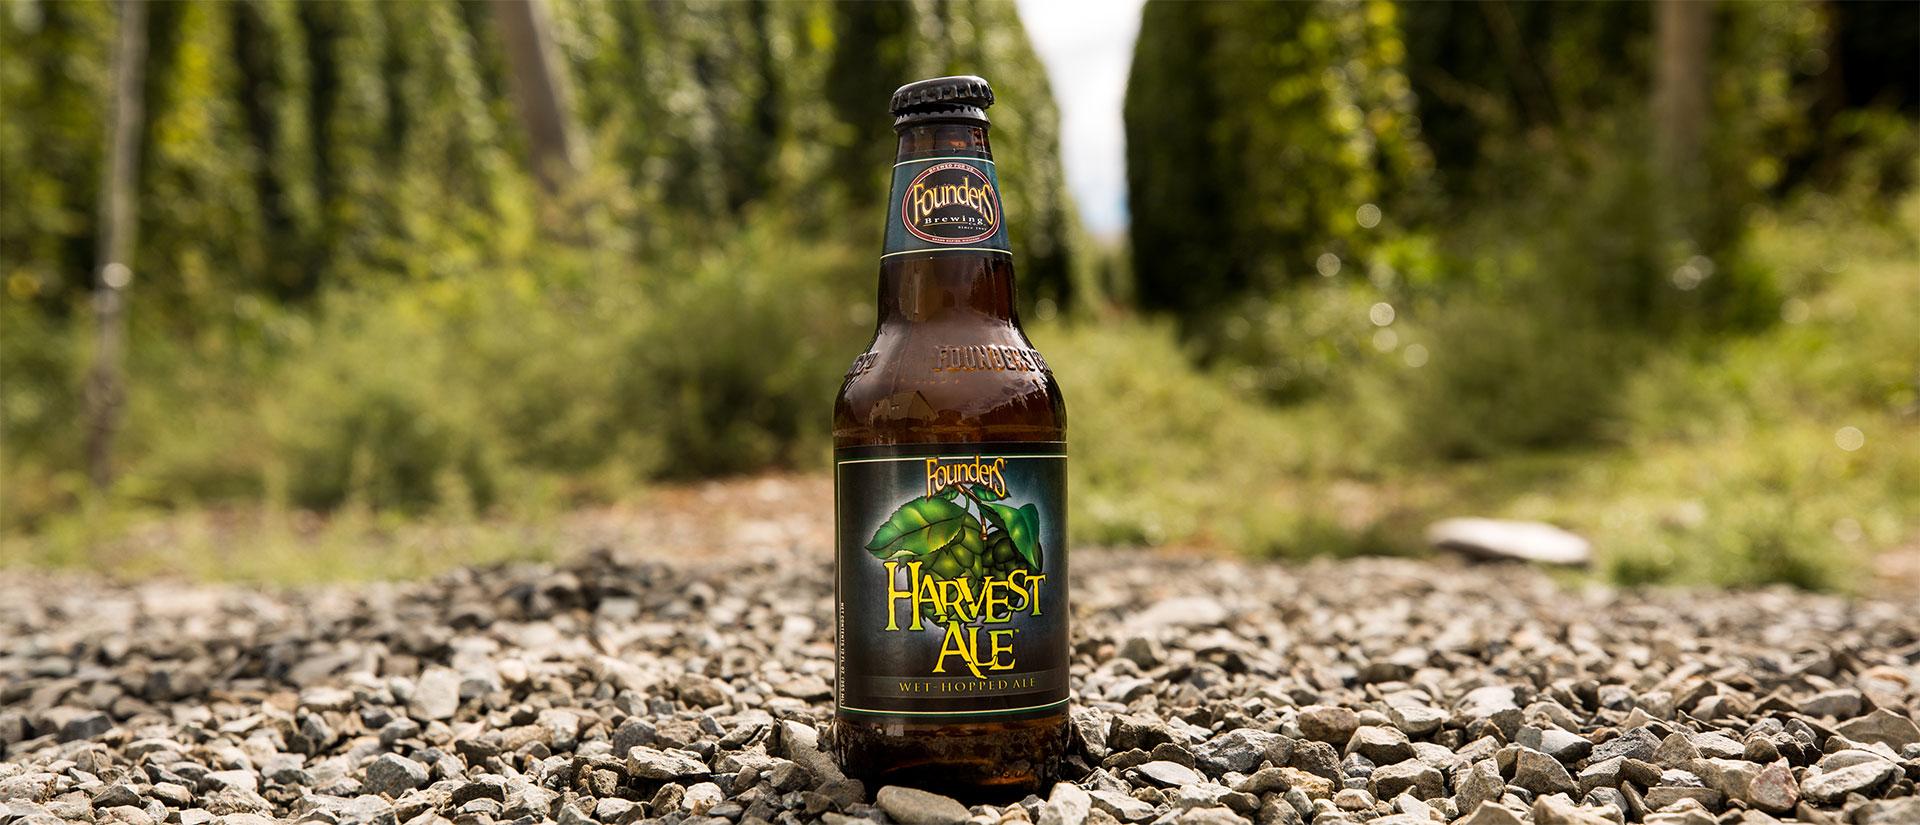 Bottle of Founders Harvest Ale